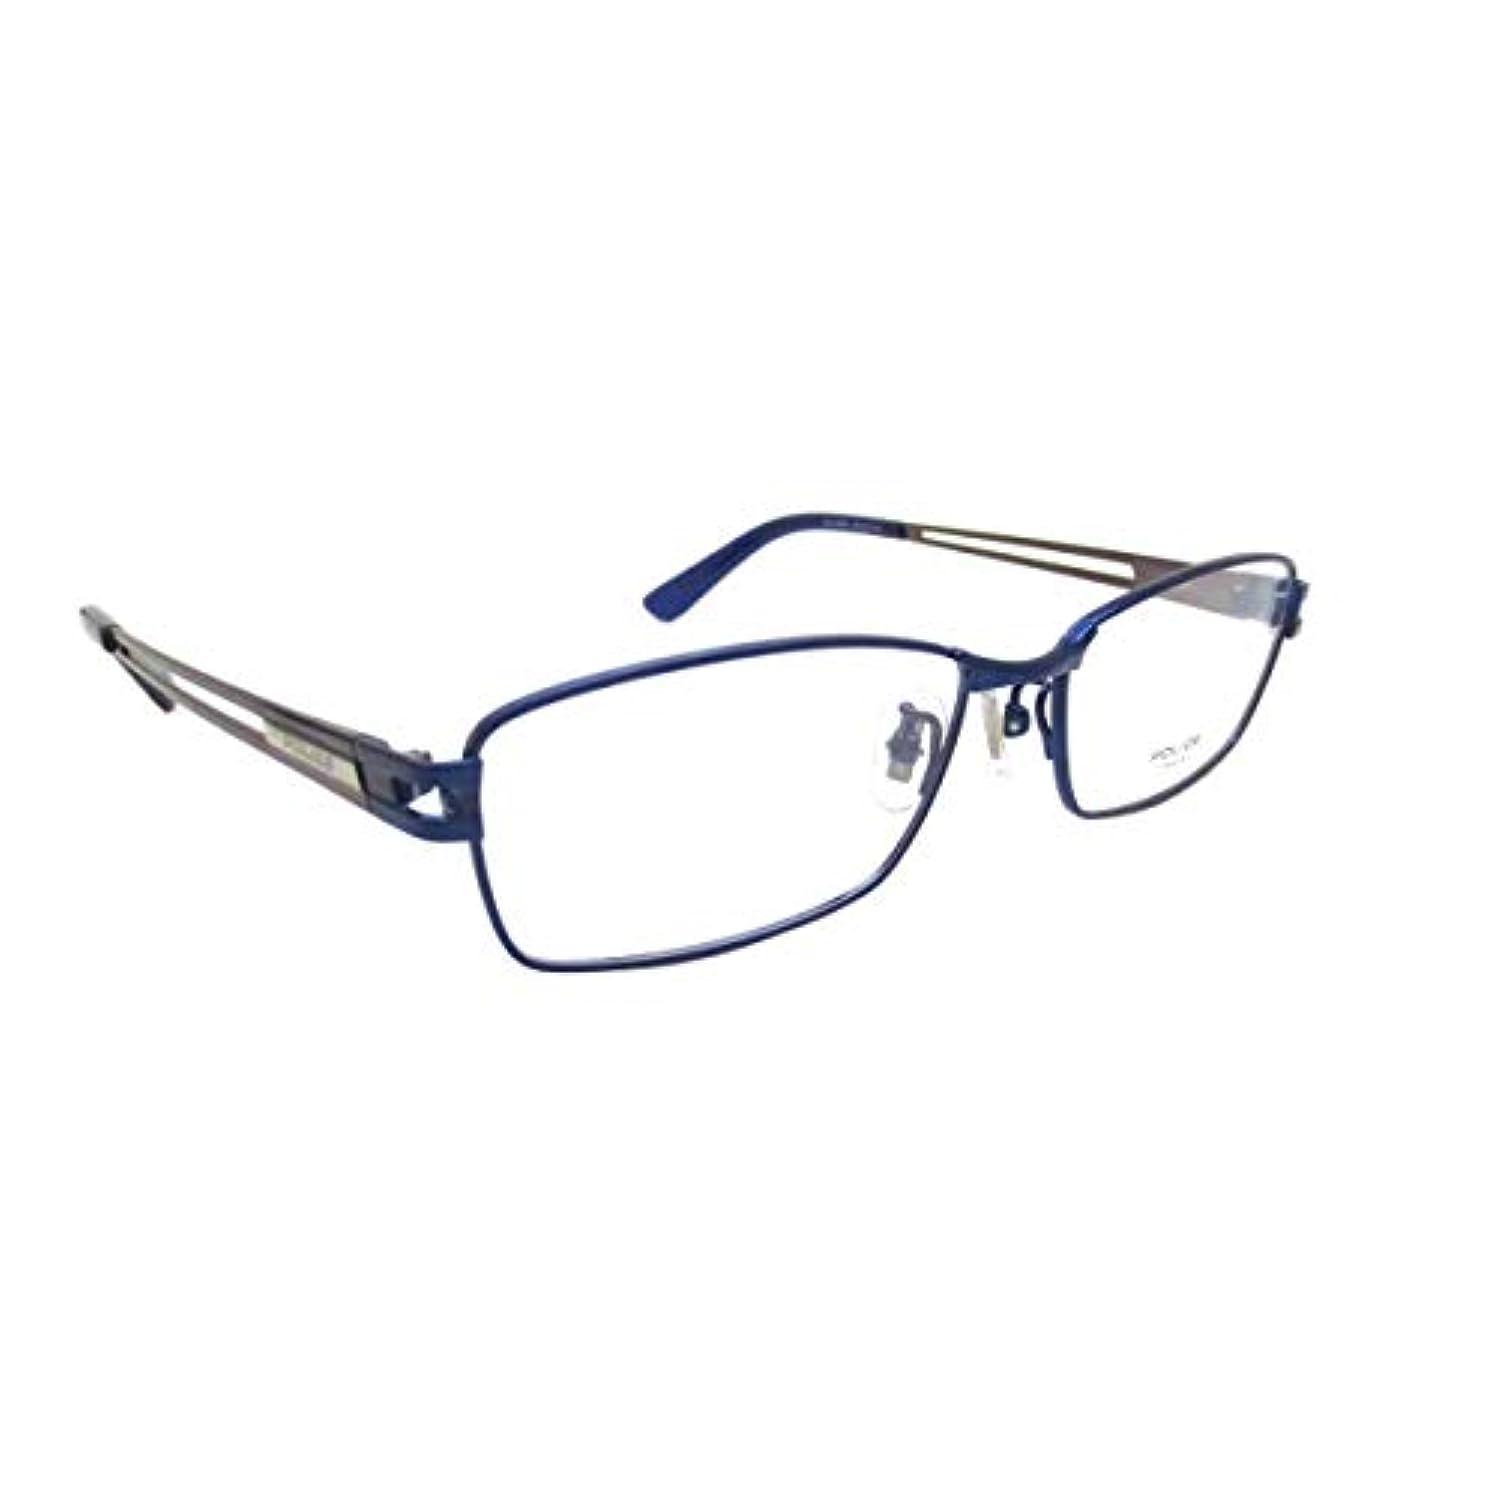 UVカット 老眼鏡にしてお届け POLICE(ポリス)Vpl827J 0N38 (54)+1.00 +1.50 +2.00 +2.50 +3.00 +3.50 +4.00